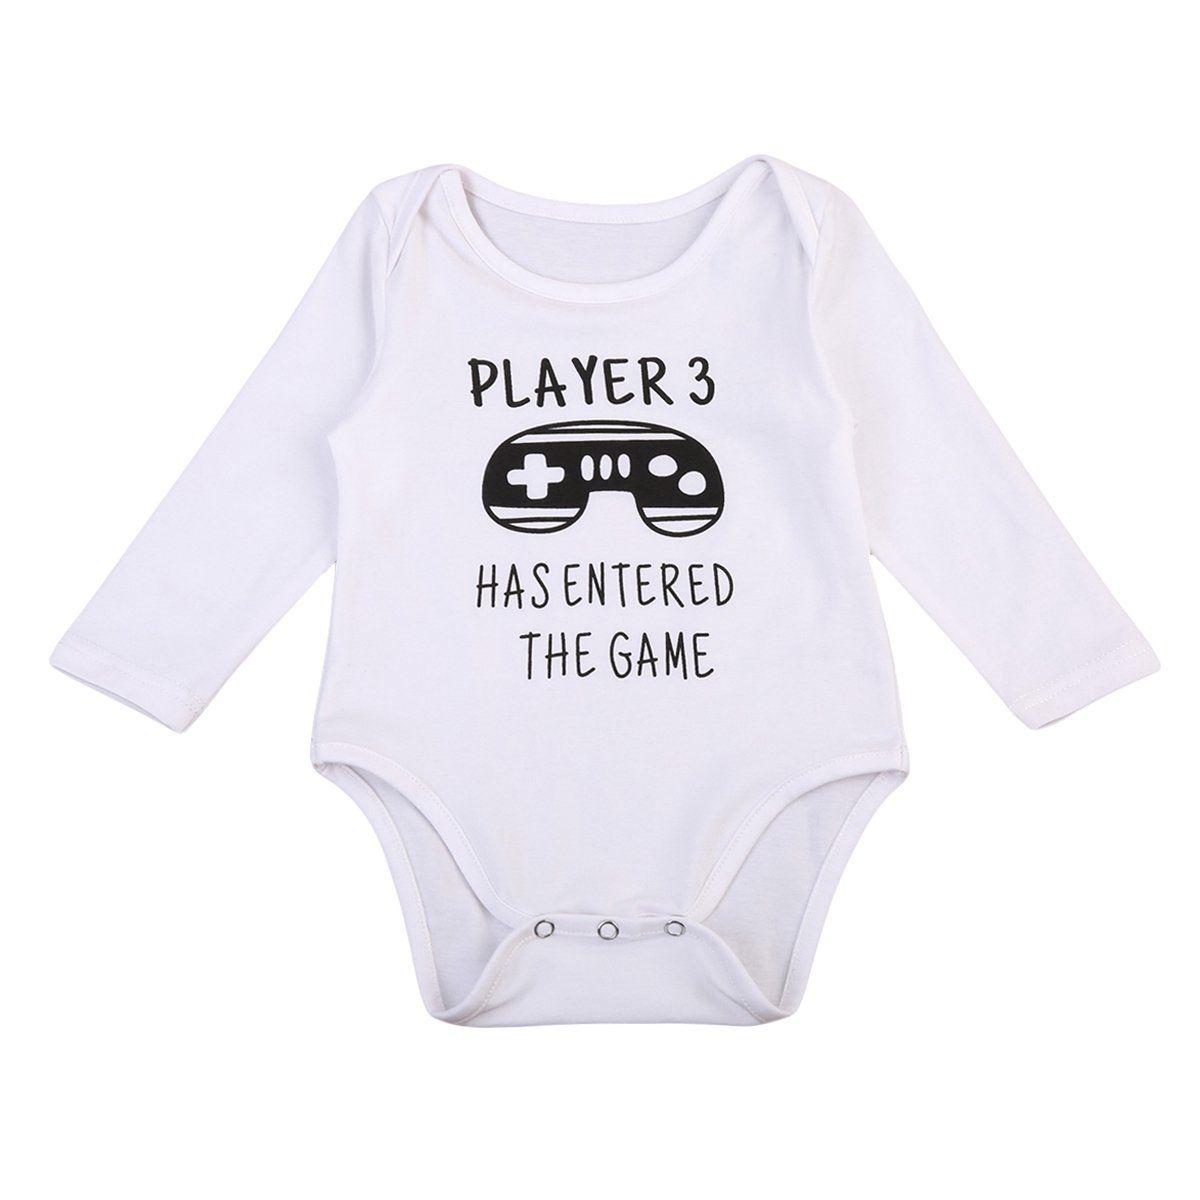 Newborn baby girl boy long sleeve onesie bodyusit letter romper